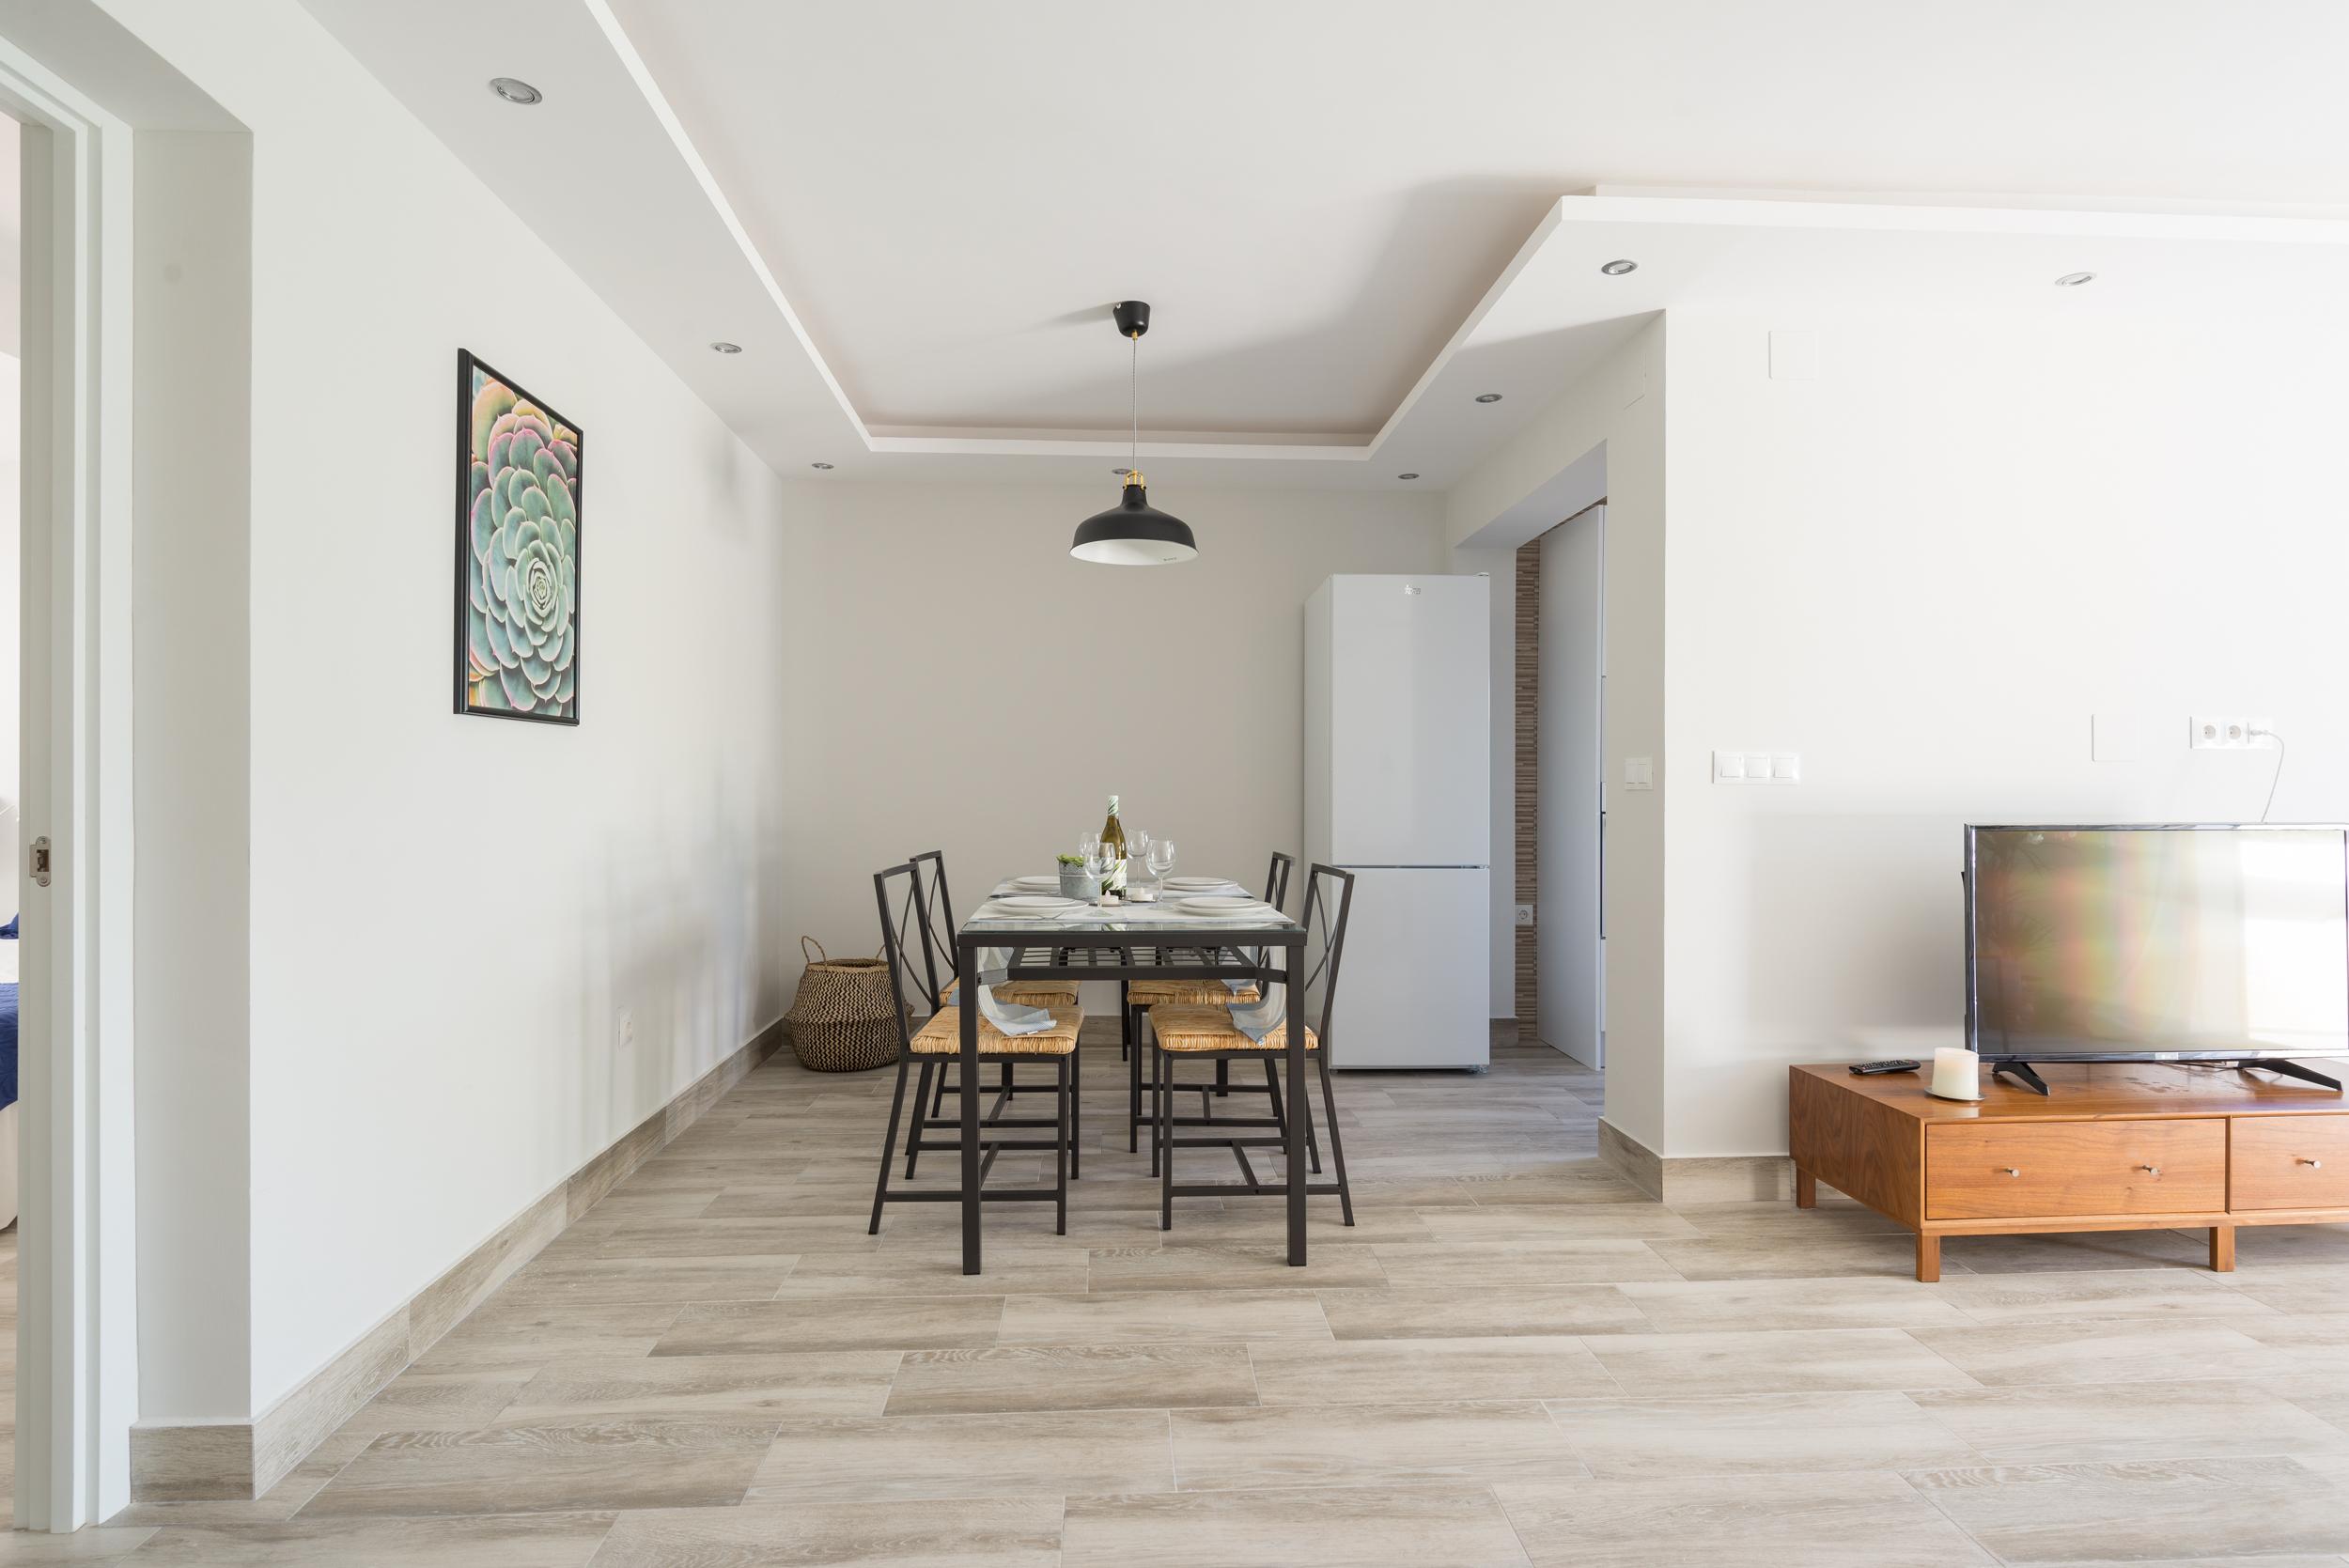 Apartment MalagaSuite House Pool photo 20515272